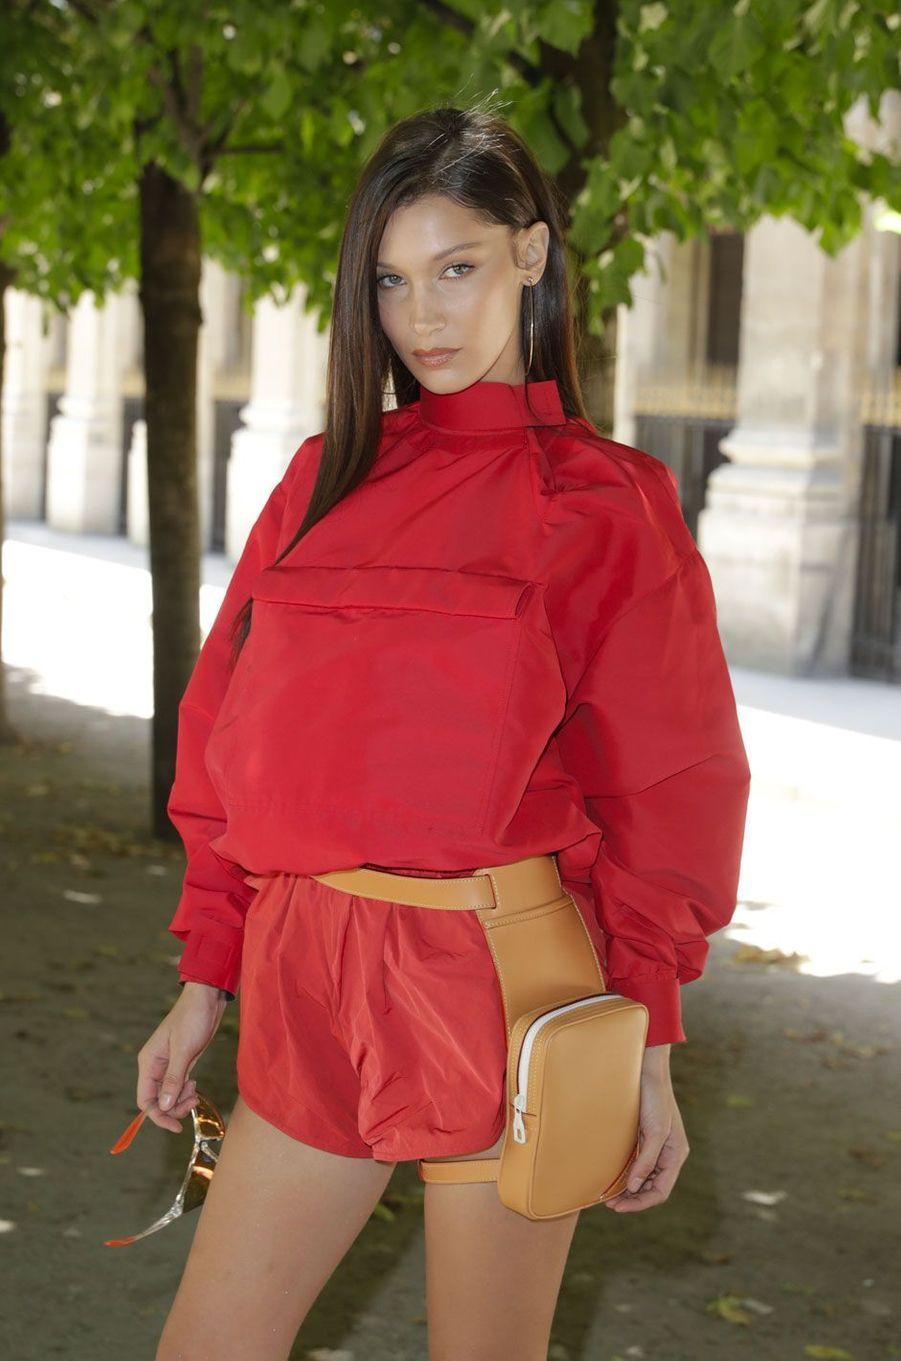 Bella Hadid à Paris le 21 juin 2018